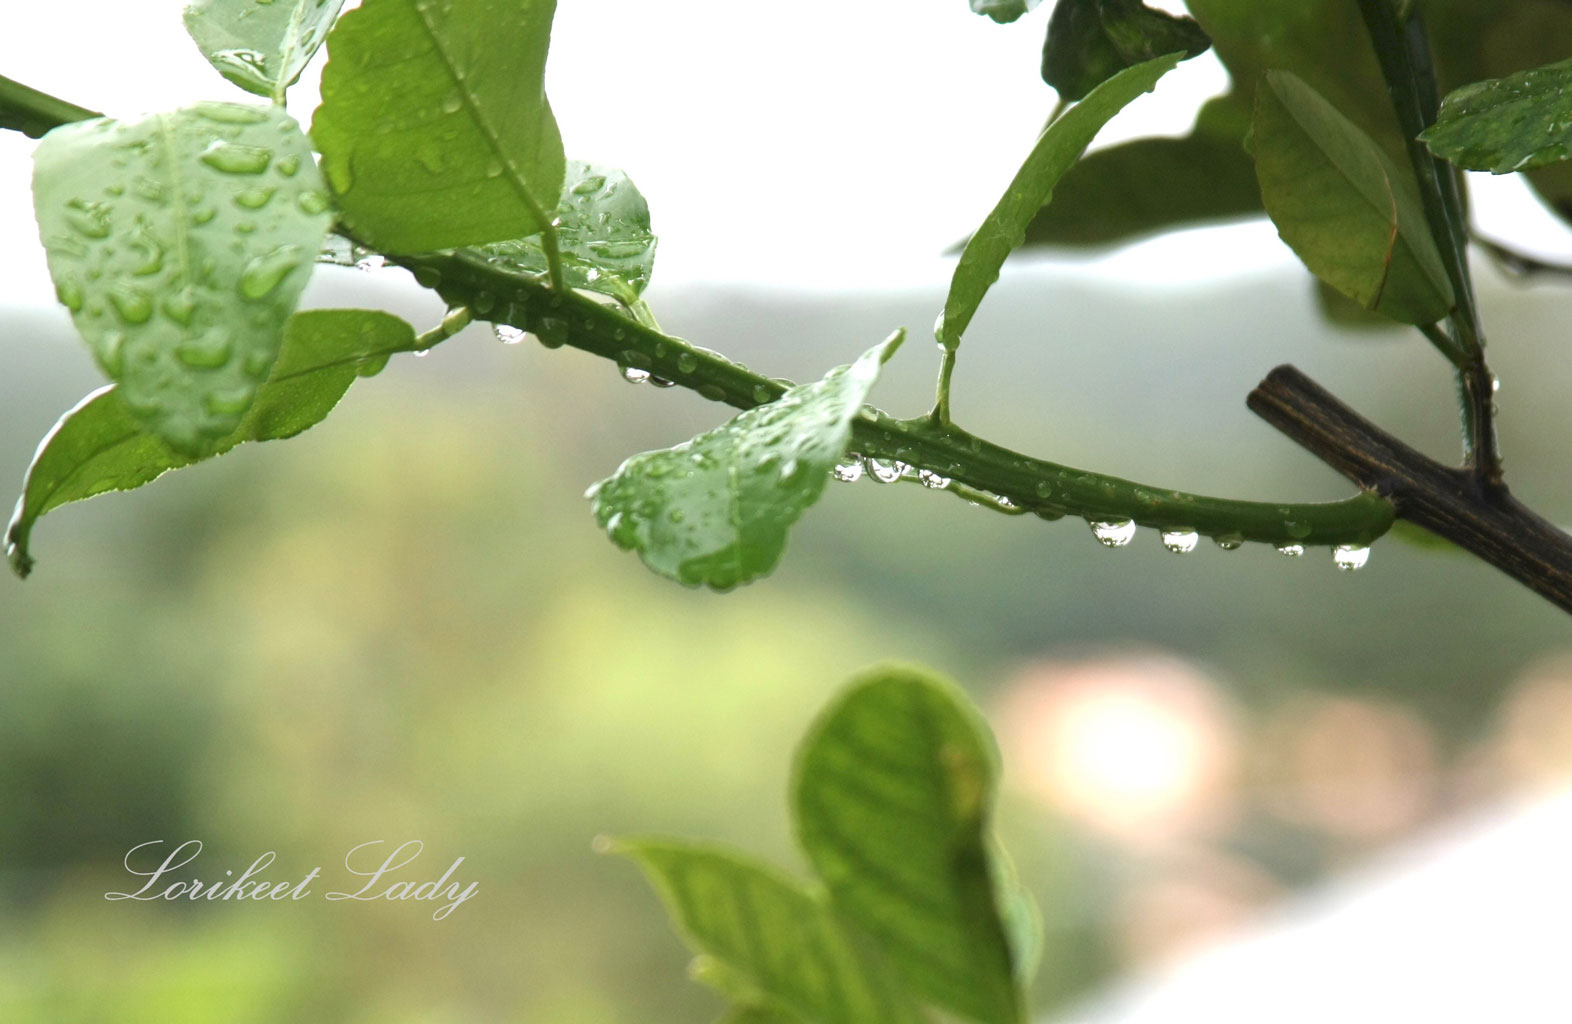 Web,-Watermark_Raindrops-on-Citrus